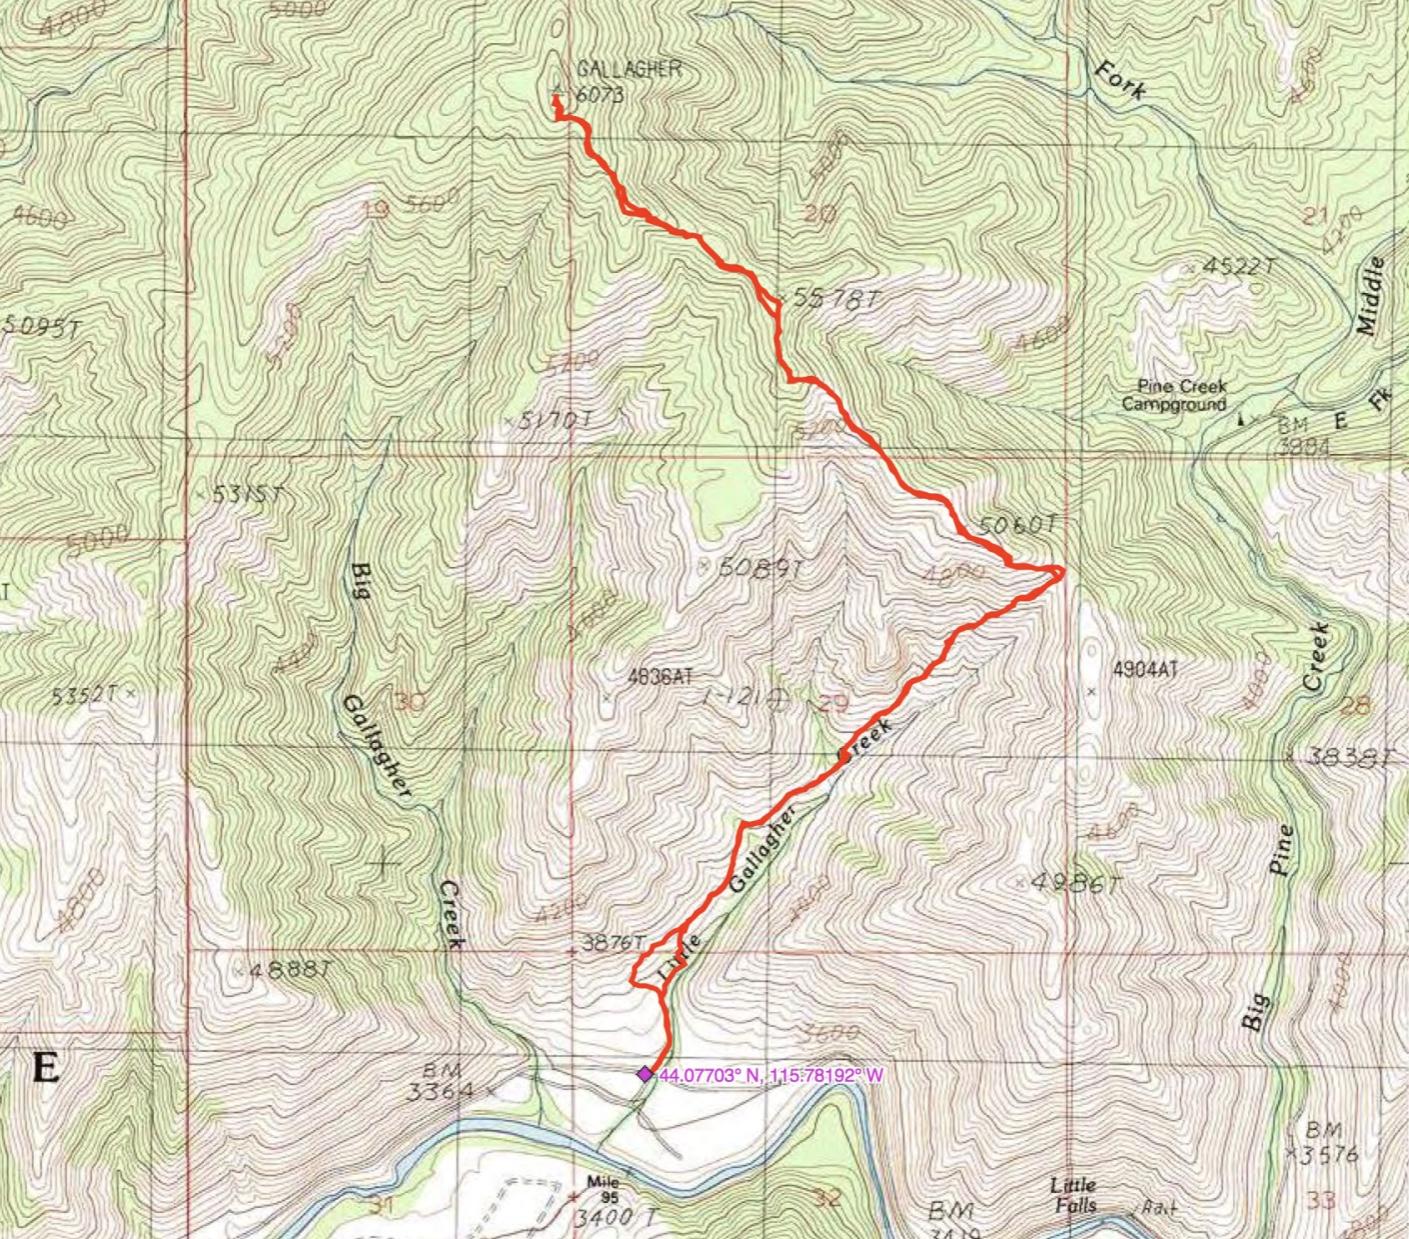 John's GPS track.